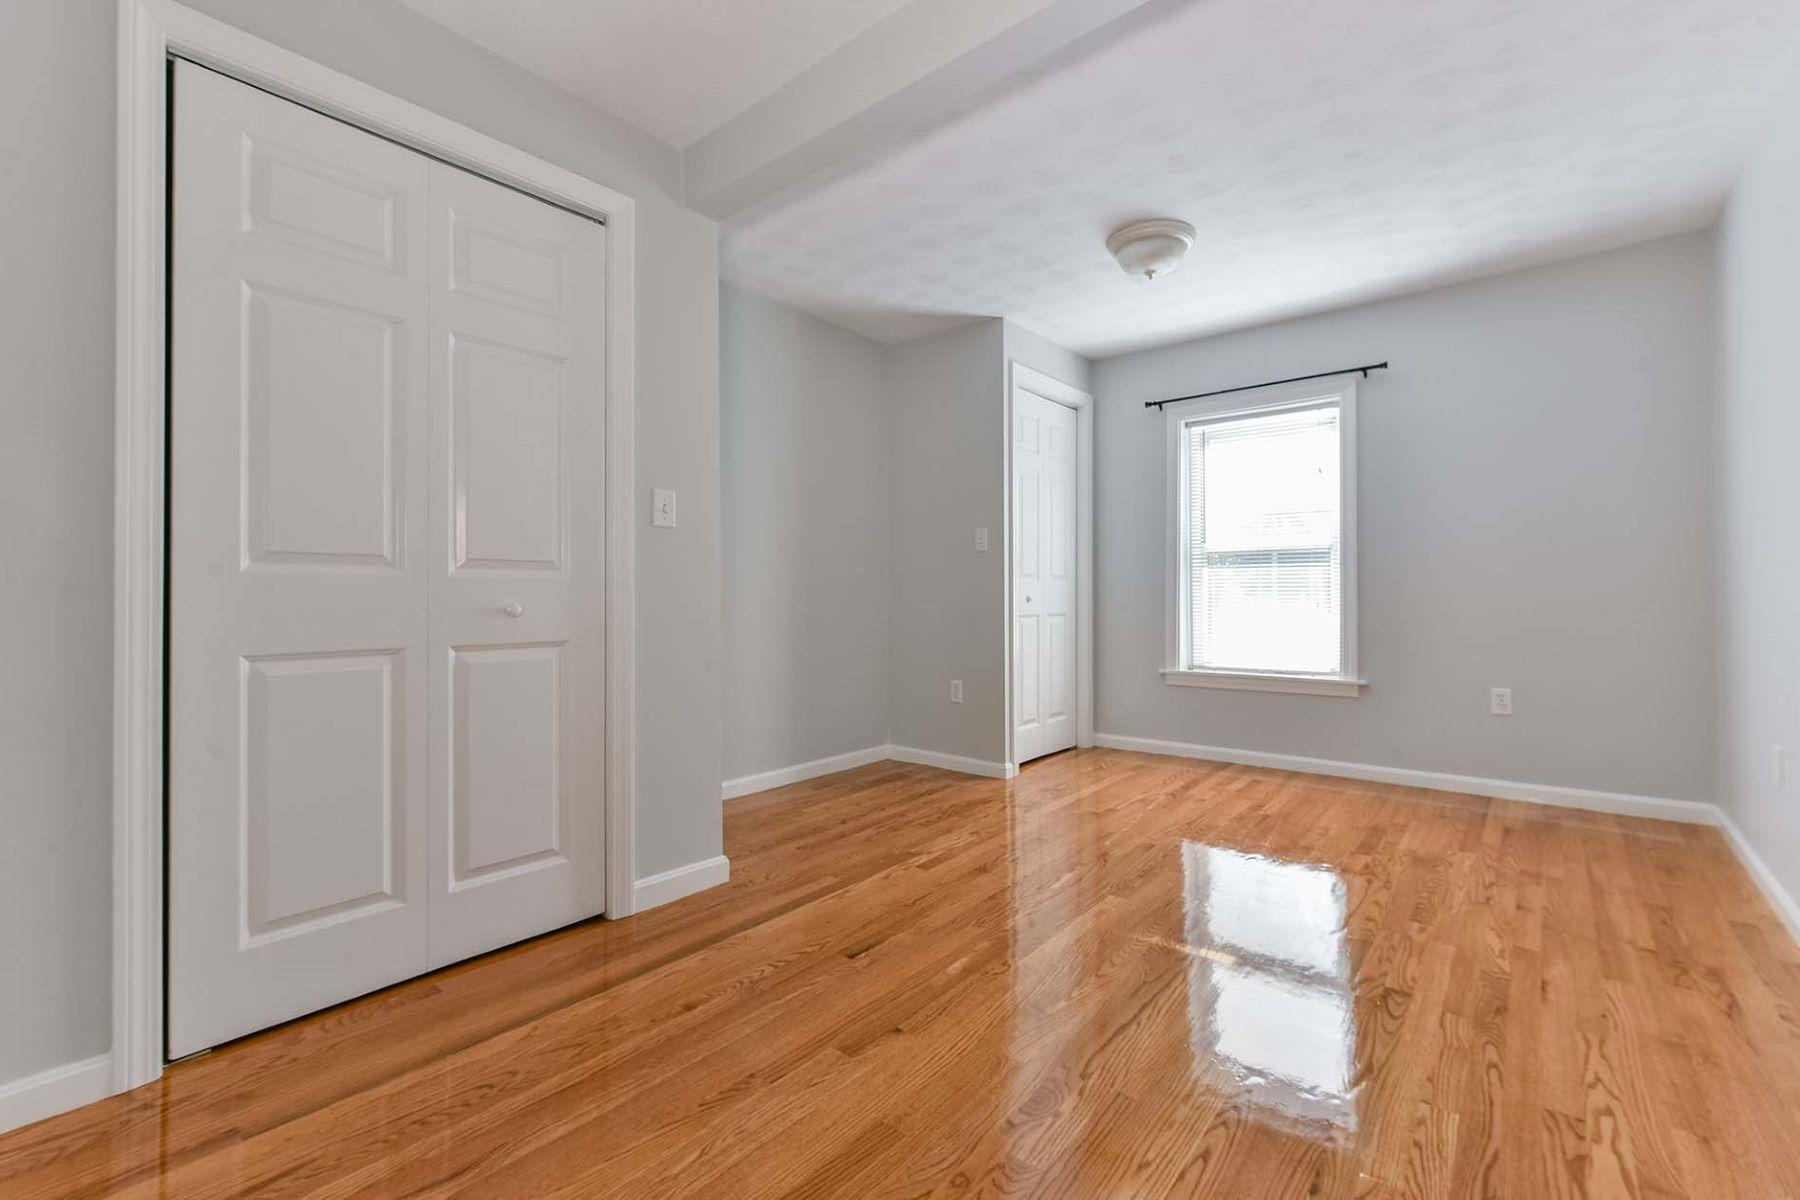 Additional photo for property listing at 240 Paris Street 2, Boston 240 Paris St 2 Boston, Massachusetts 02128 United States